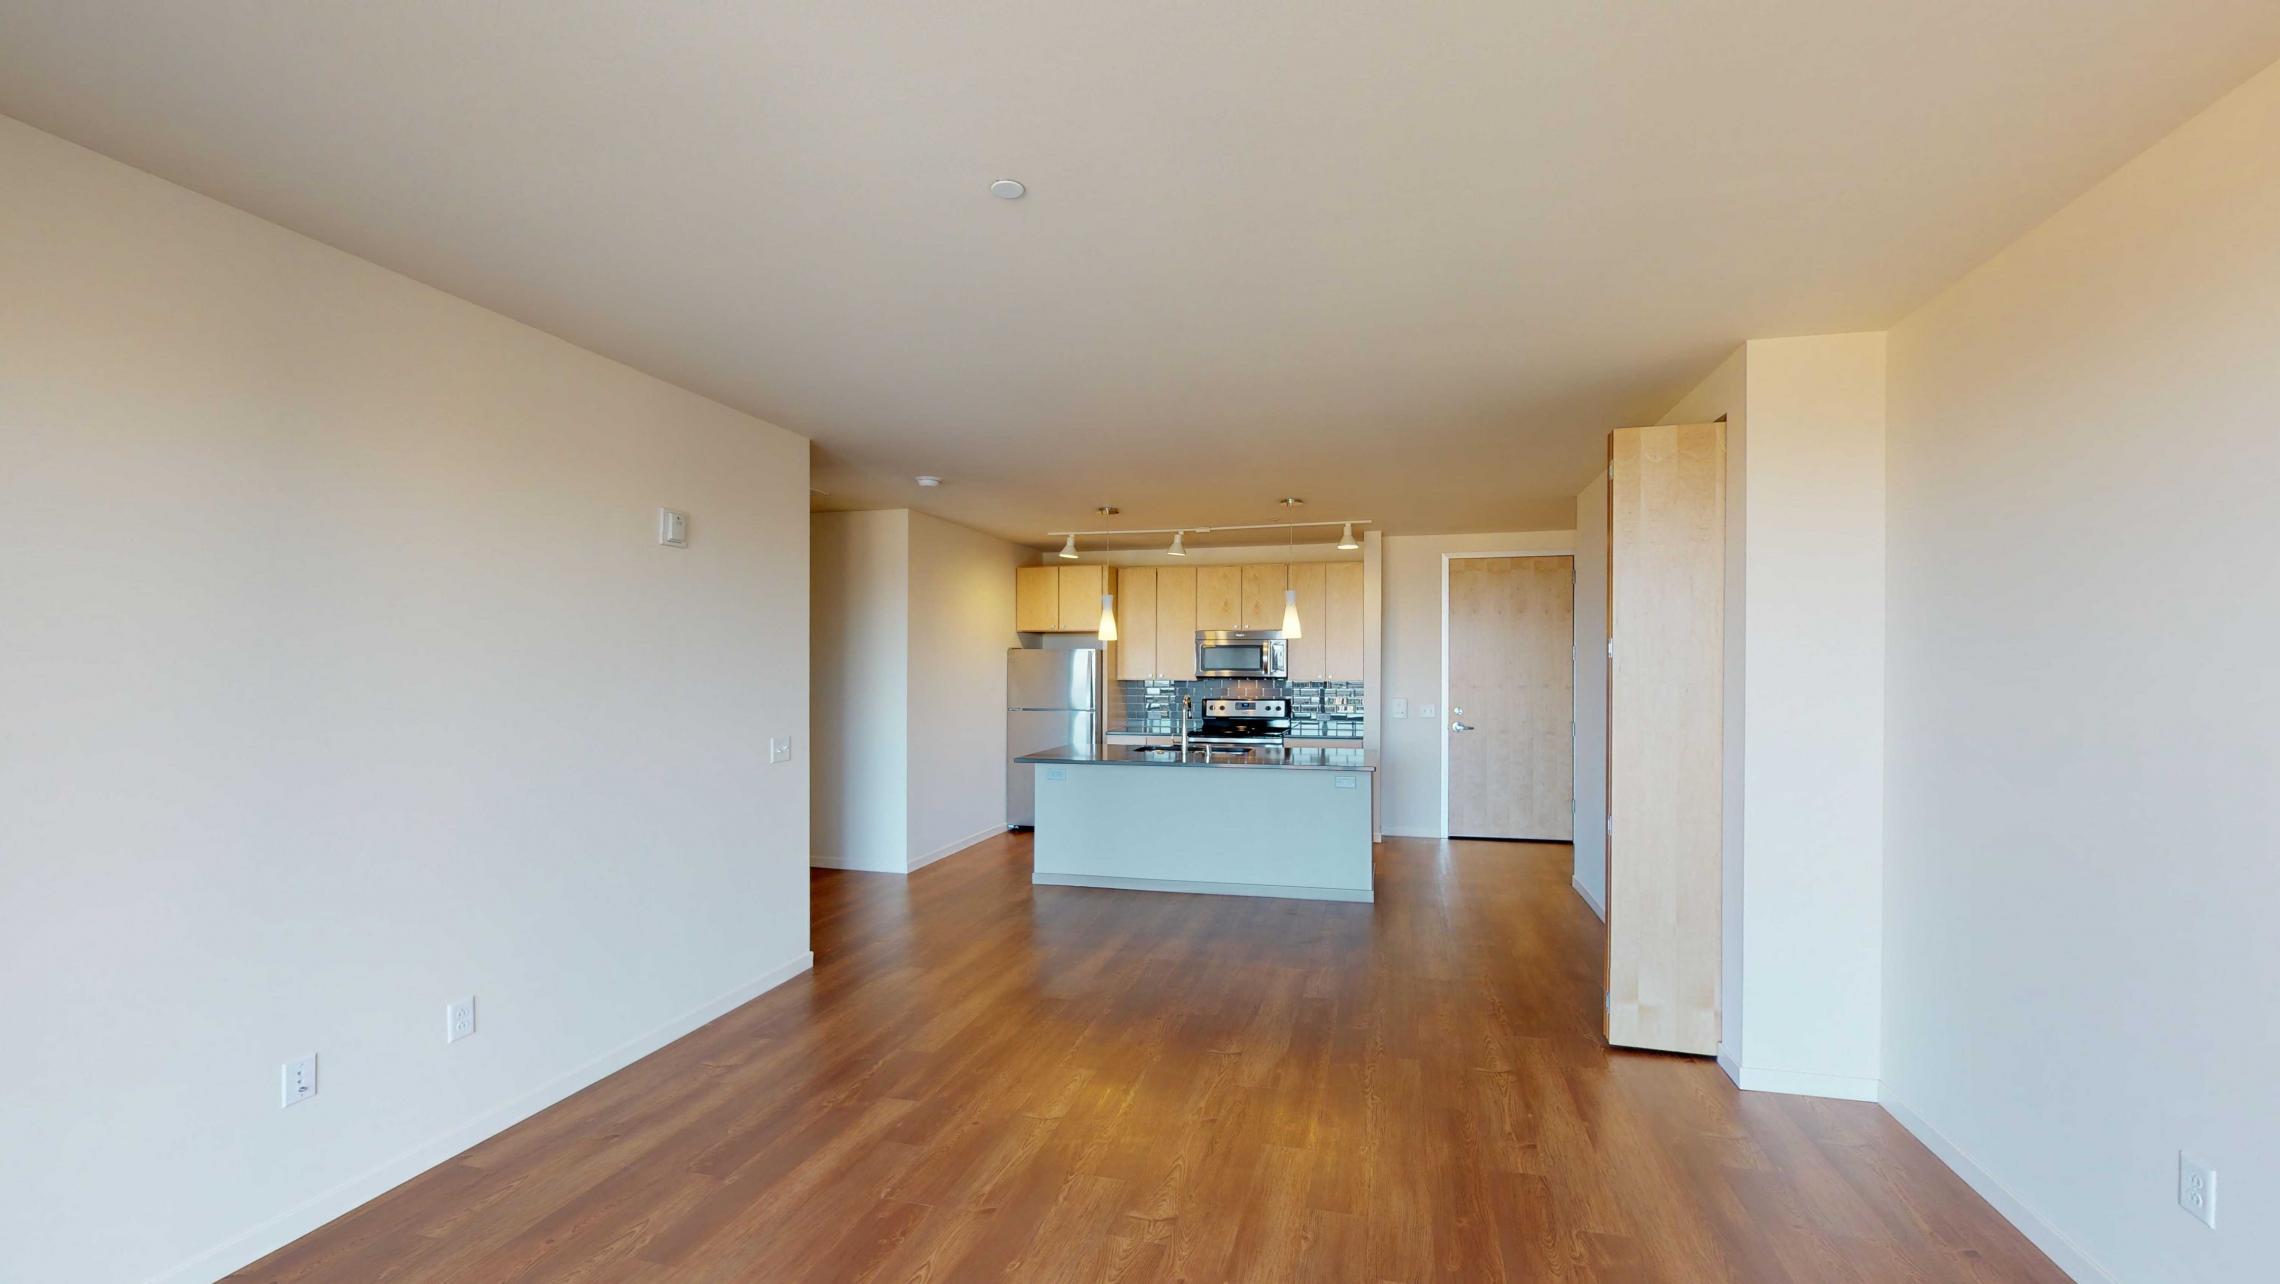 Nine-Line-Apartment-419-kitchen-appliances-modern-lake-view-downtown-Capitol-Madison-lifestyle